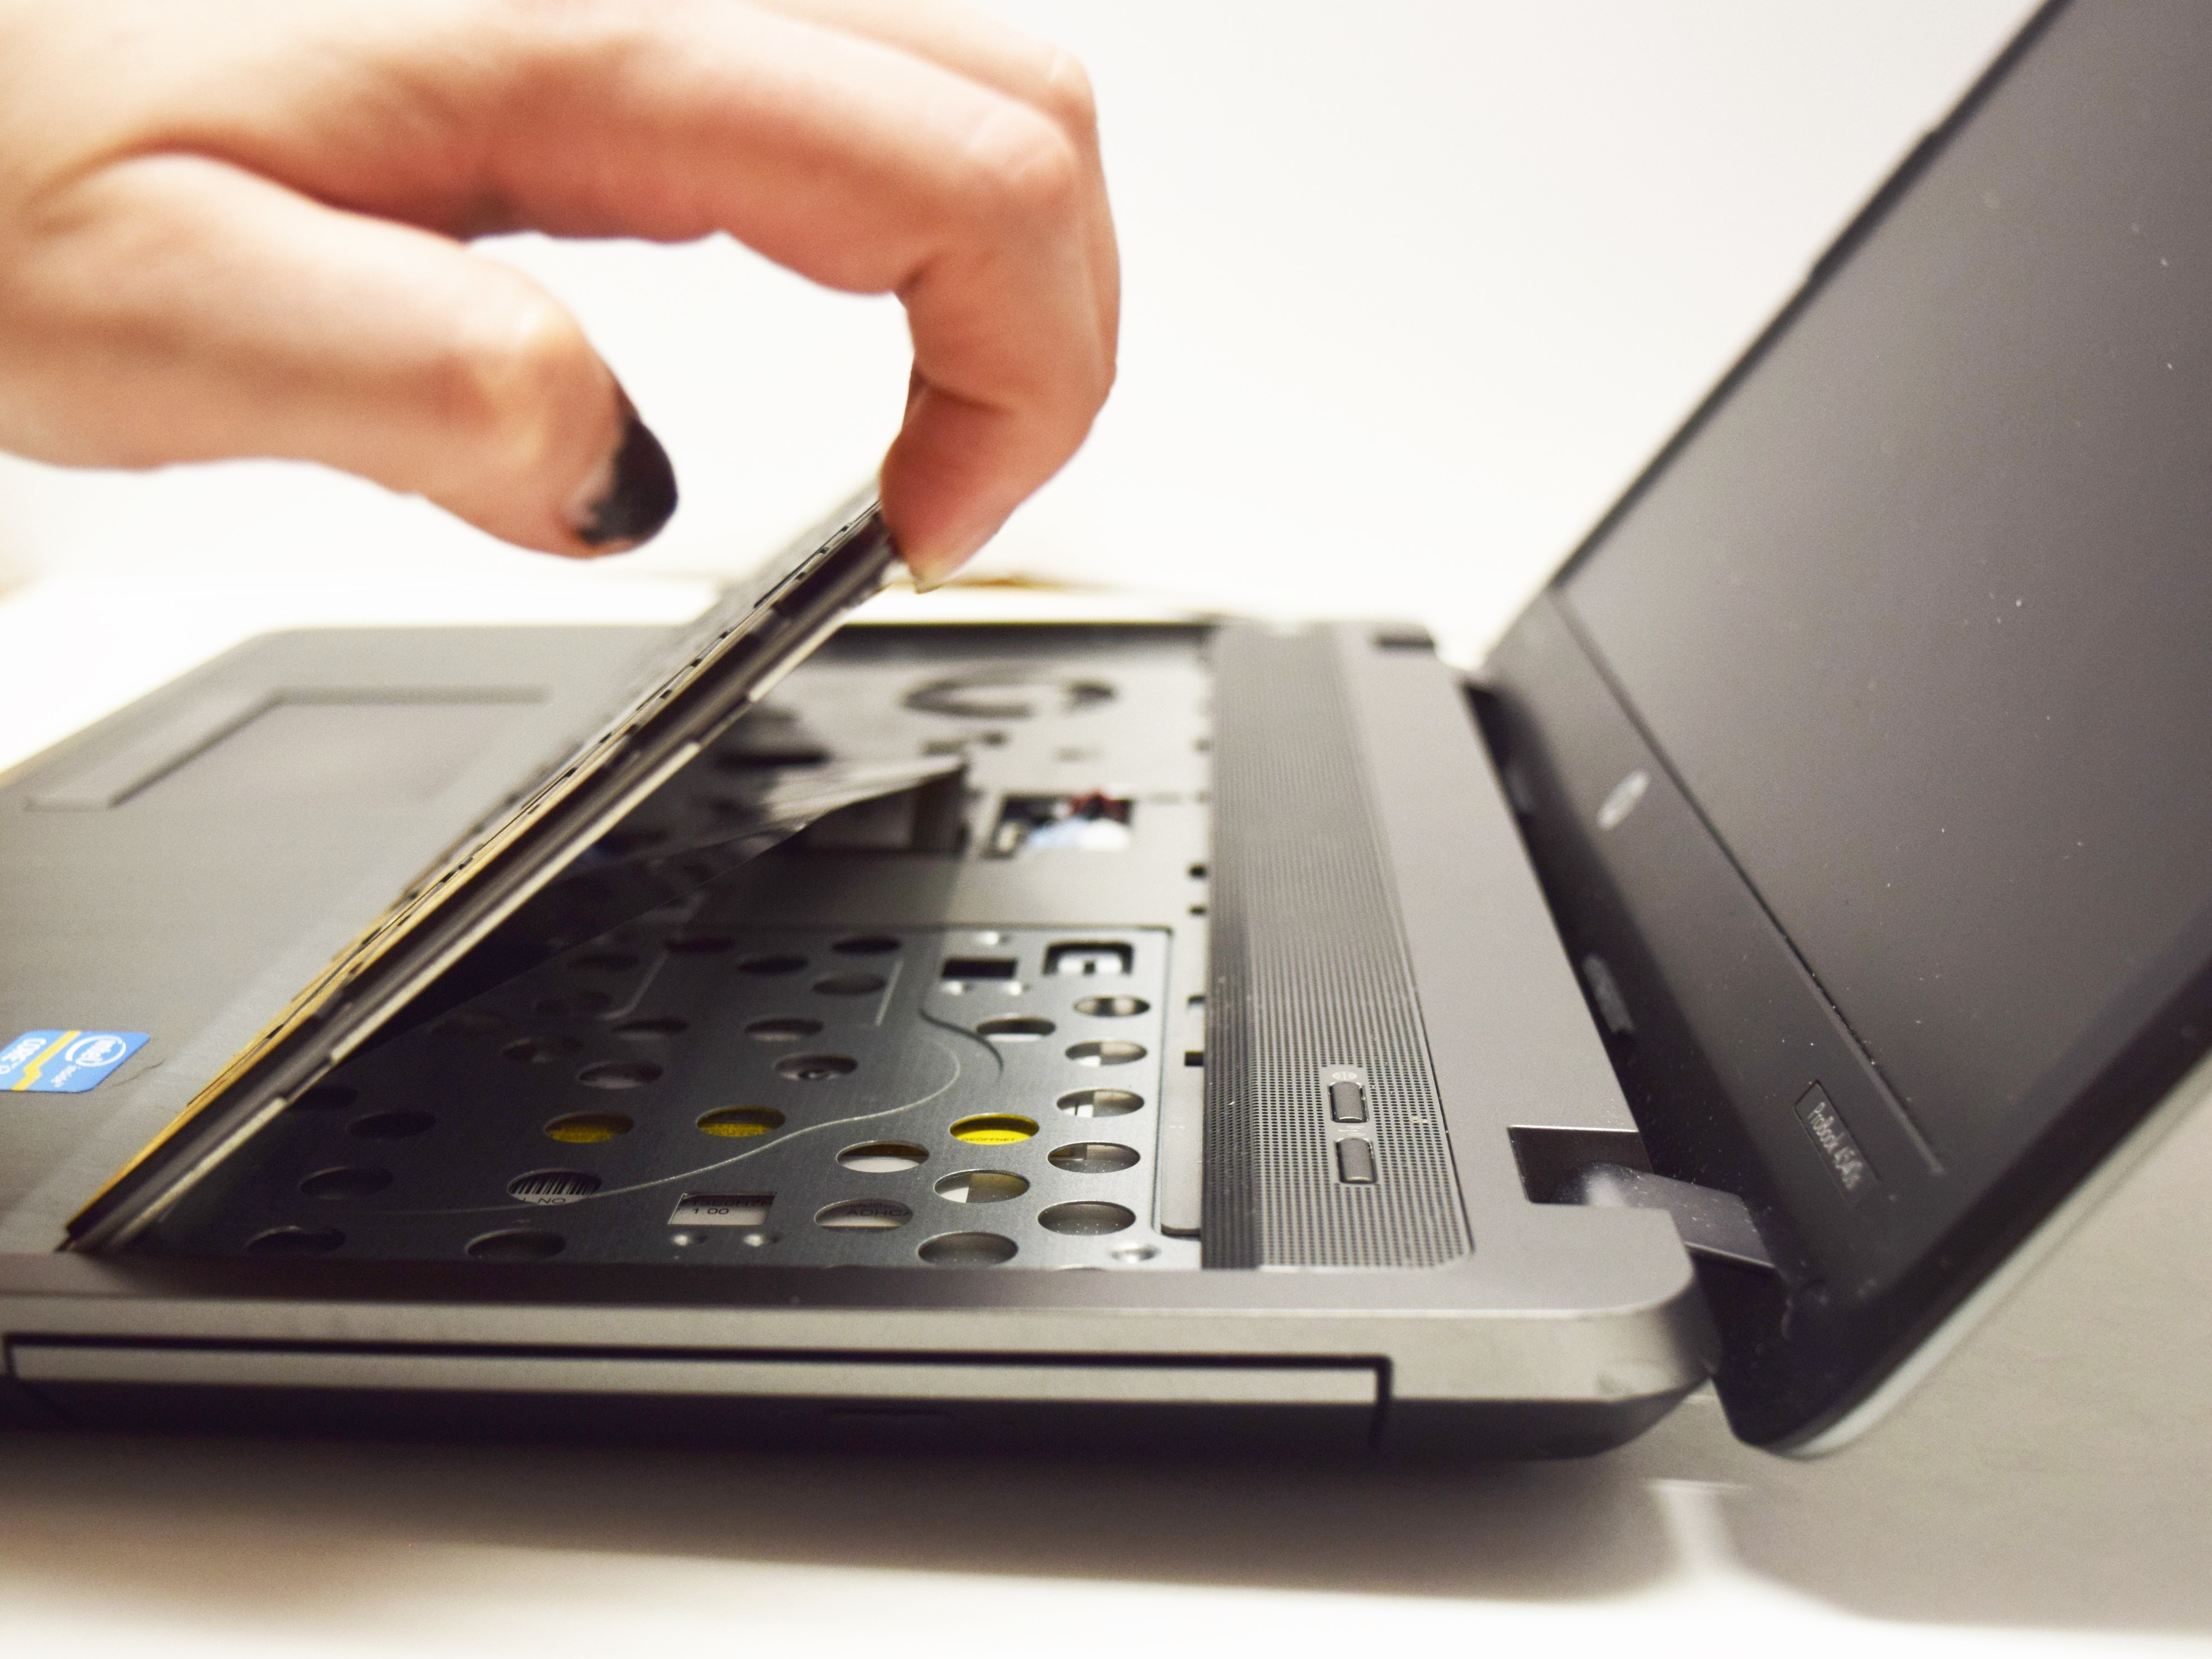 Install Mac Os X On Hp Probook 4540s Battery - staffride